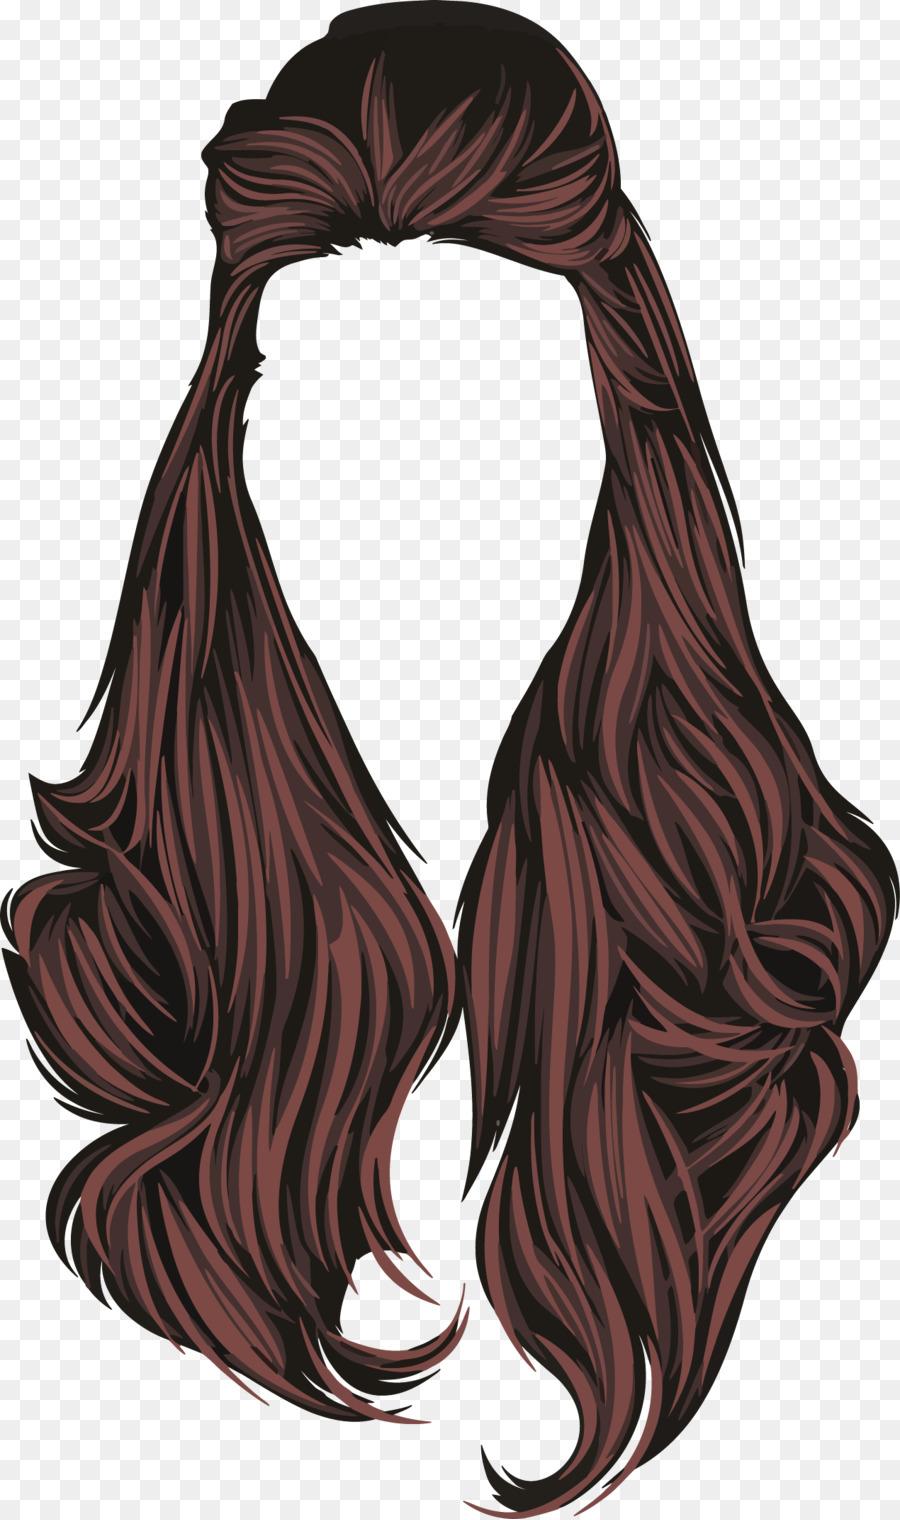 900x1520 Adobe Illustrator Hair Drawing Tutorial